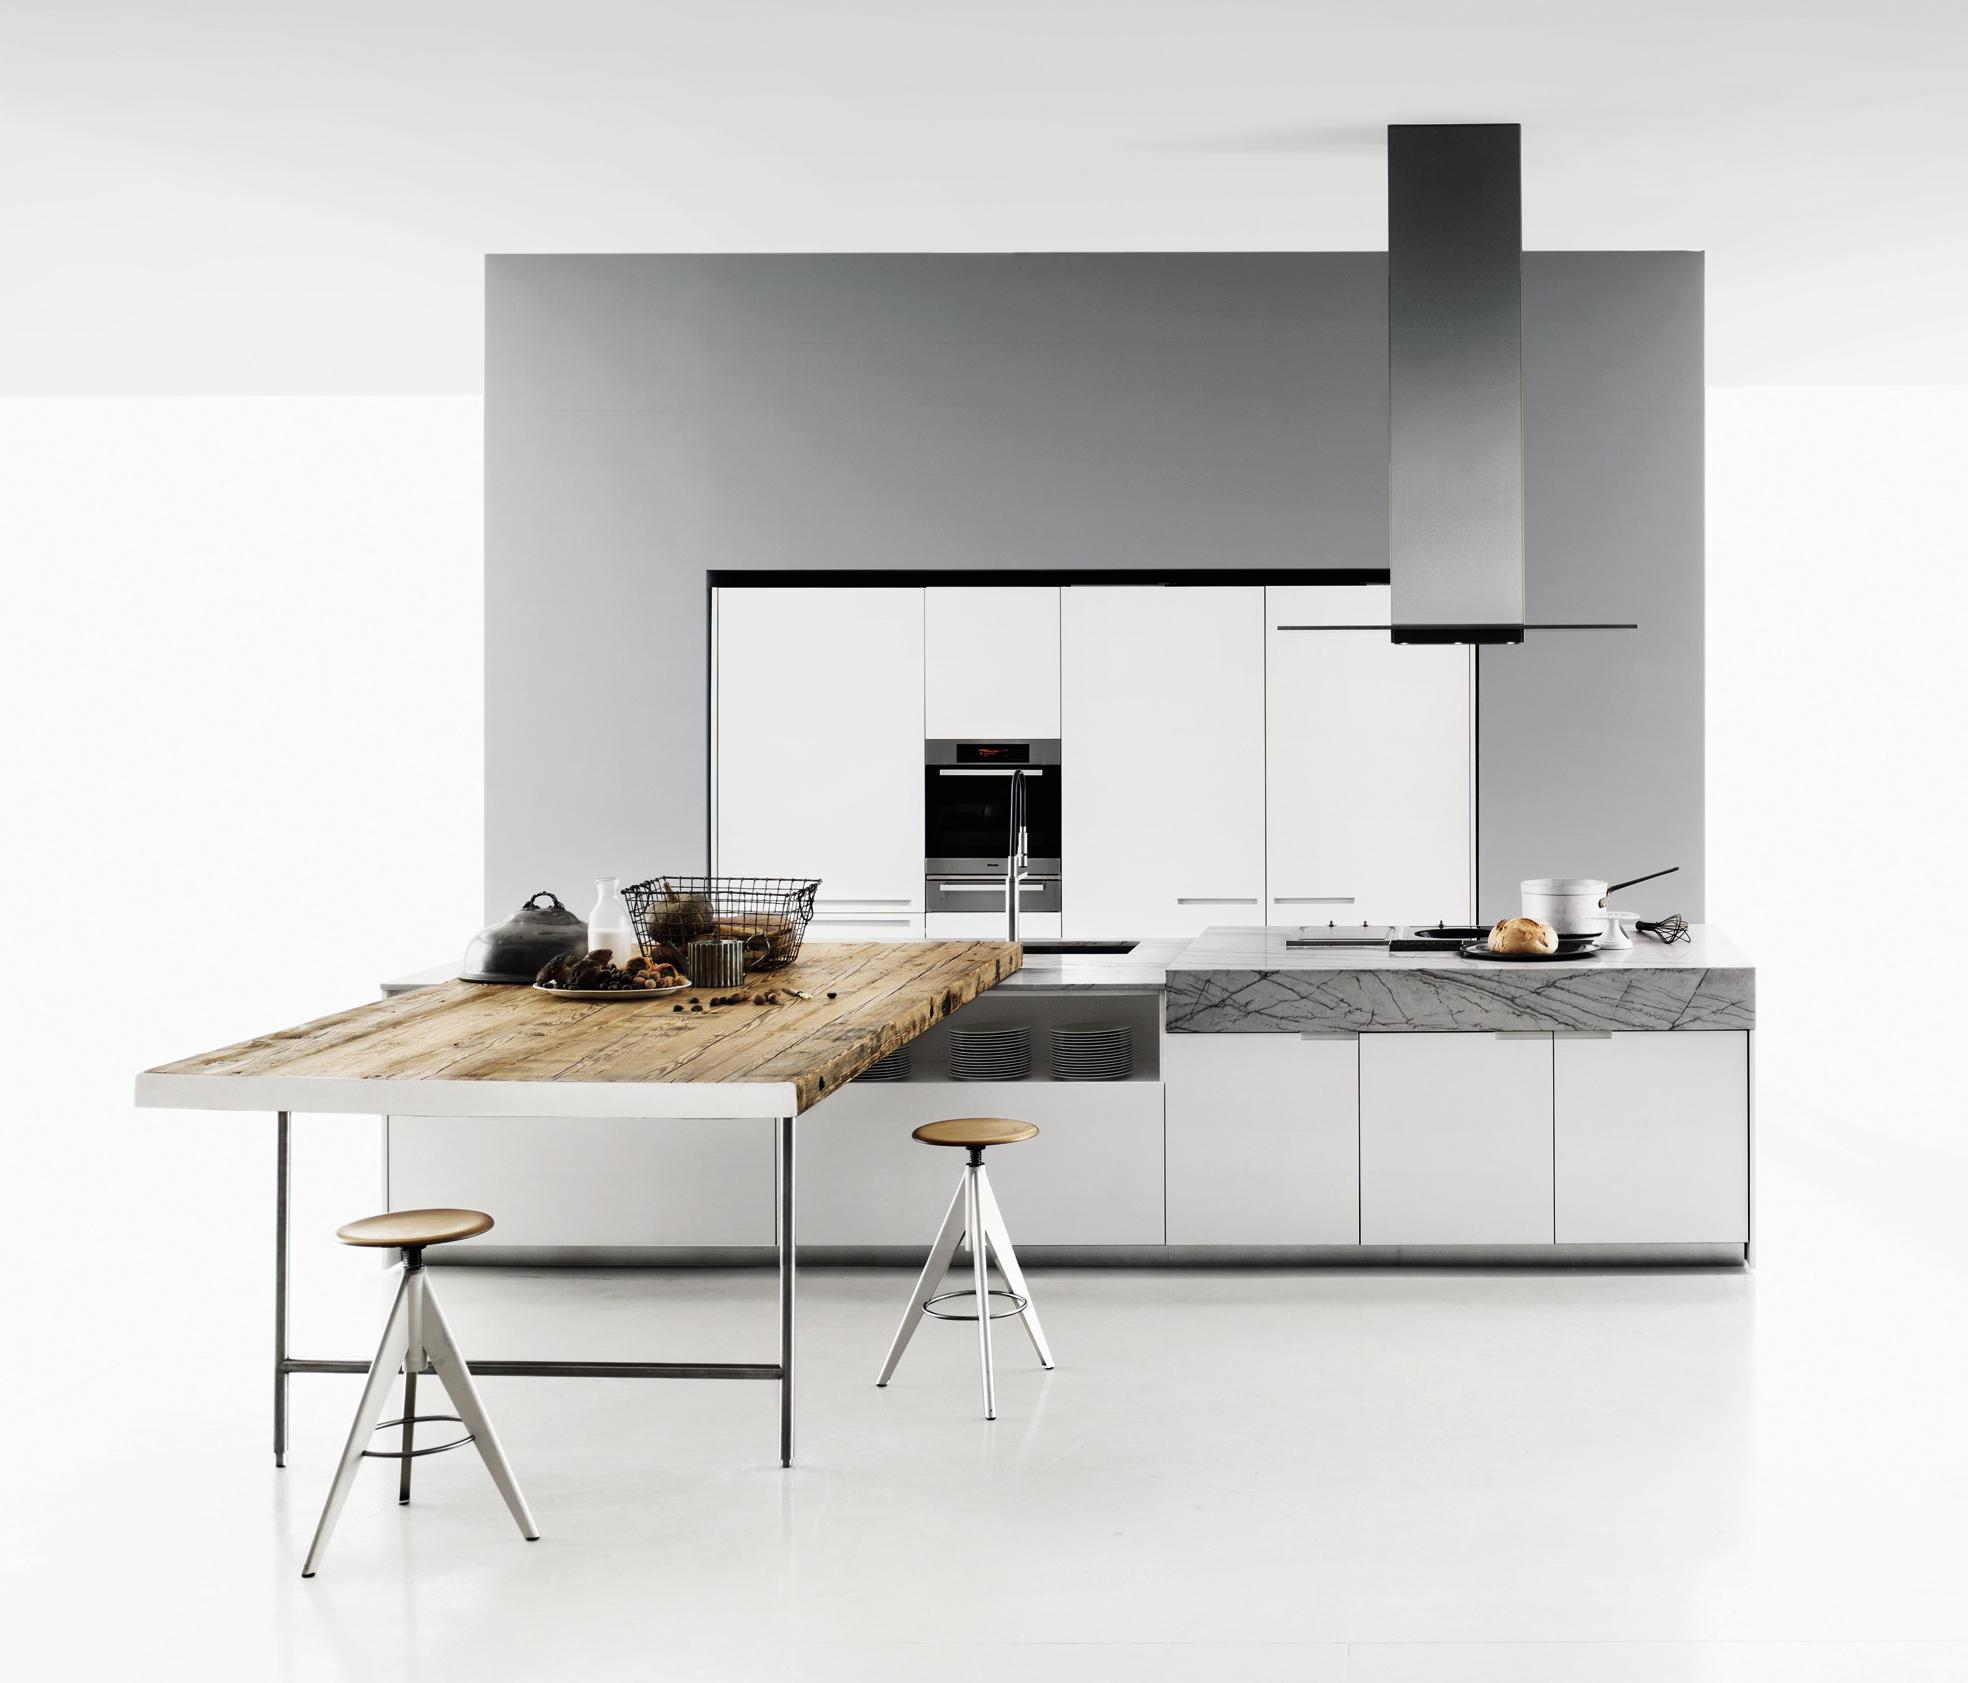 Stunning boffi cucine catalogo contemporary ideas - Cucine boffi catalogo ...